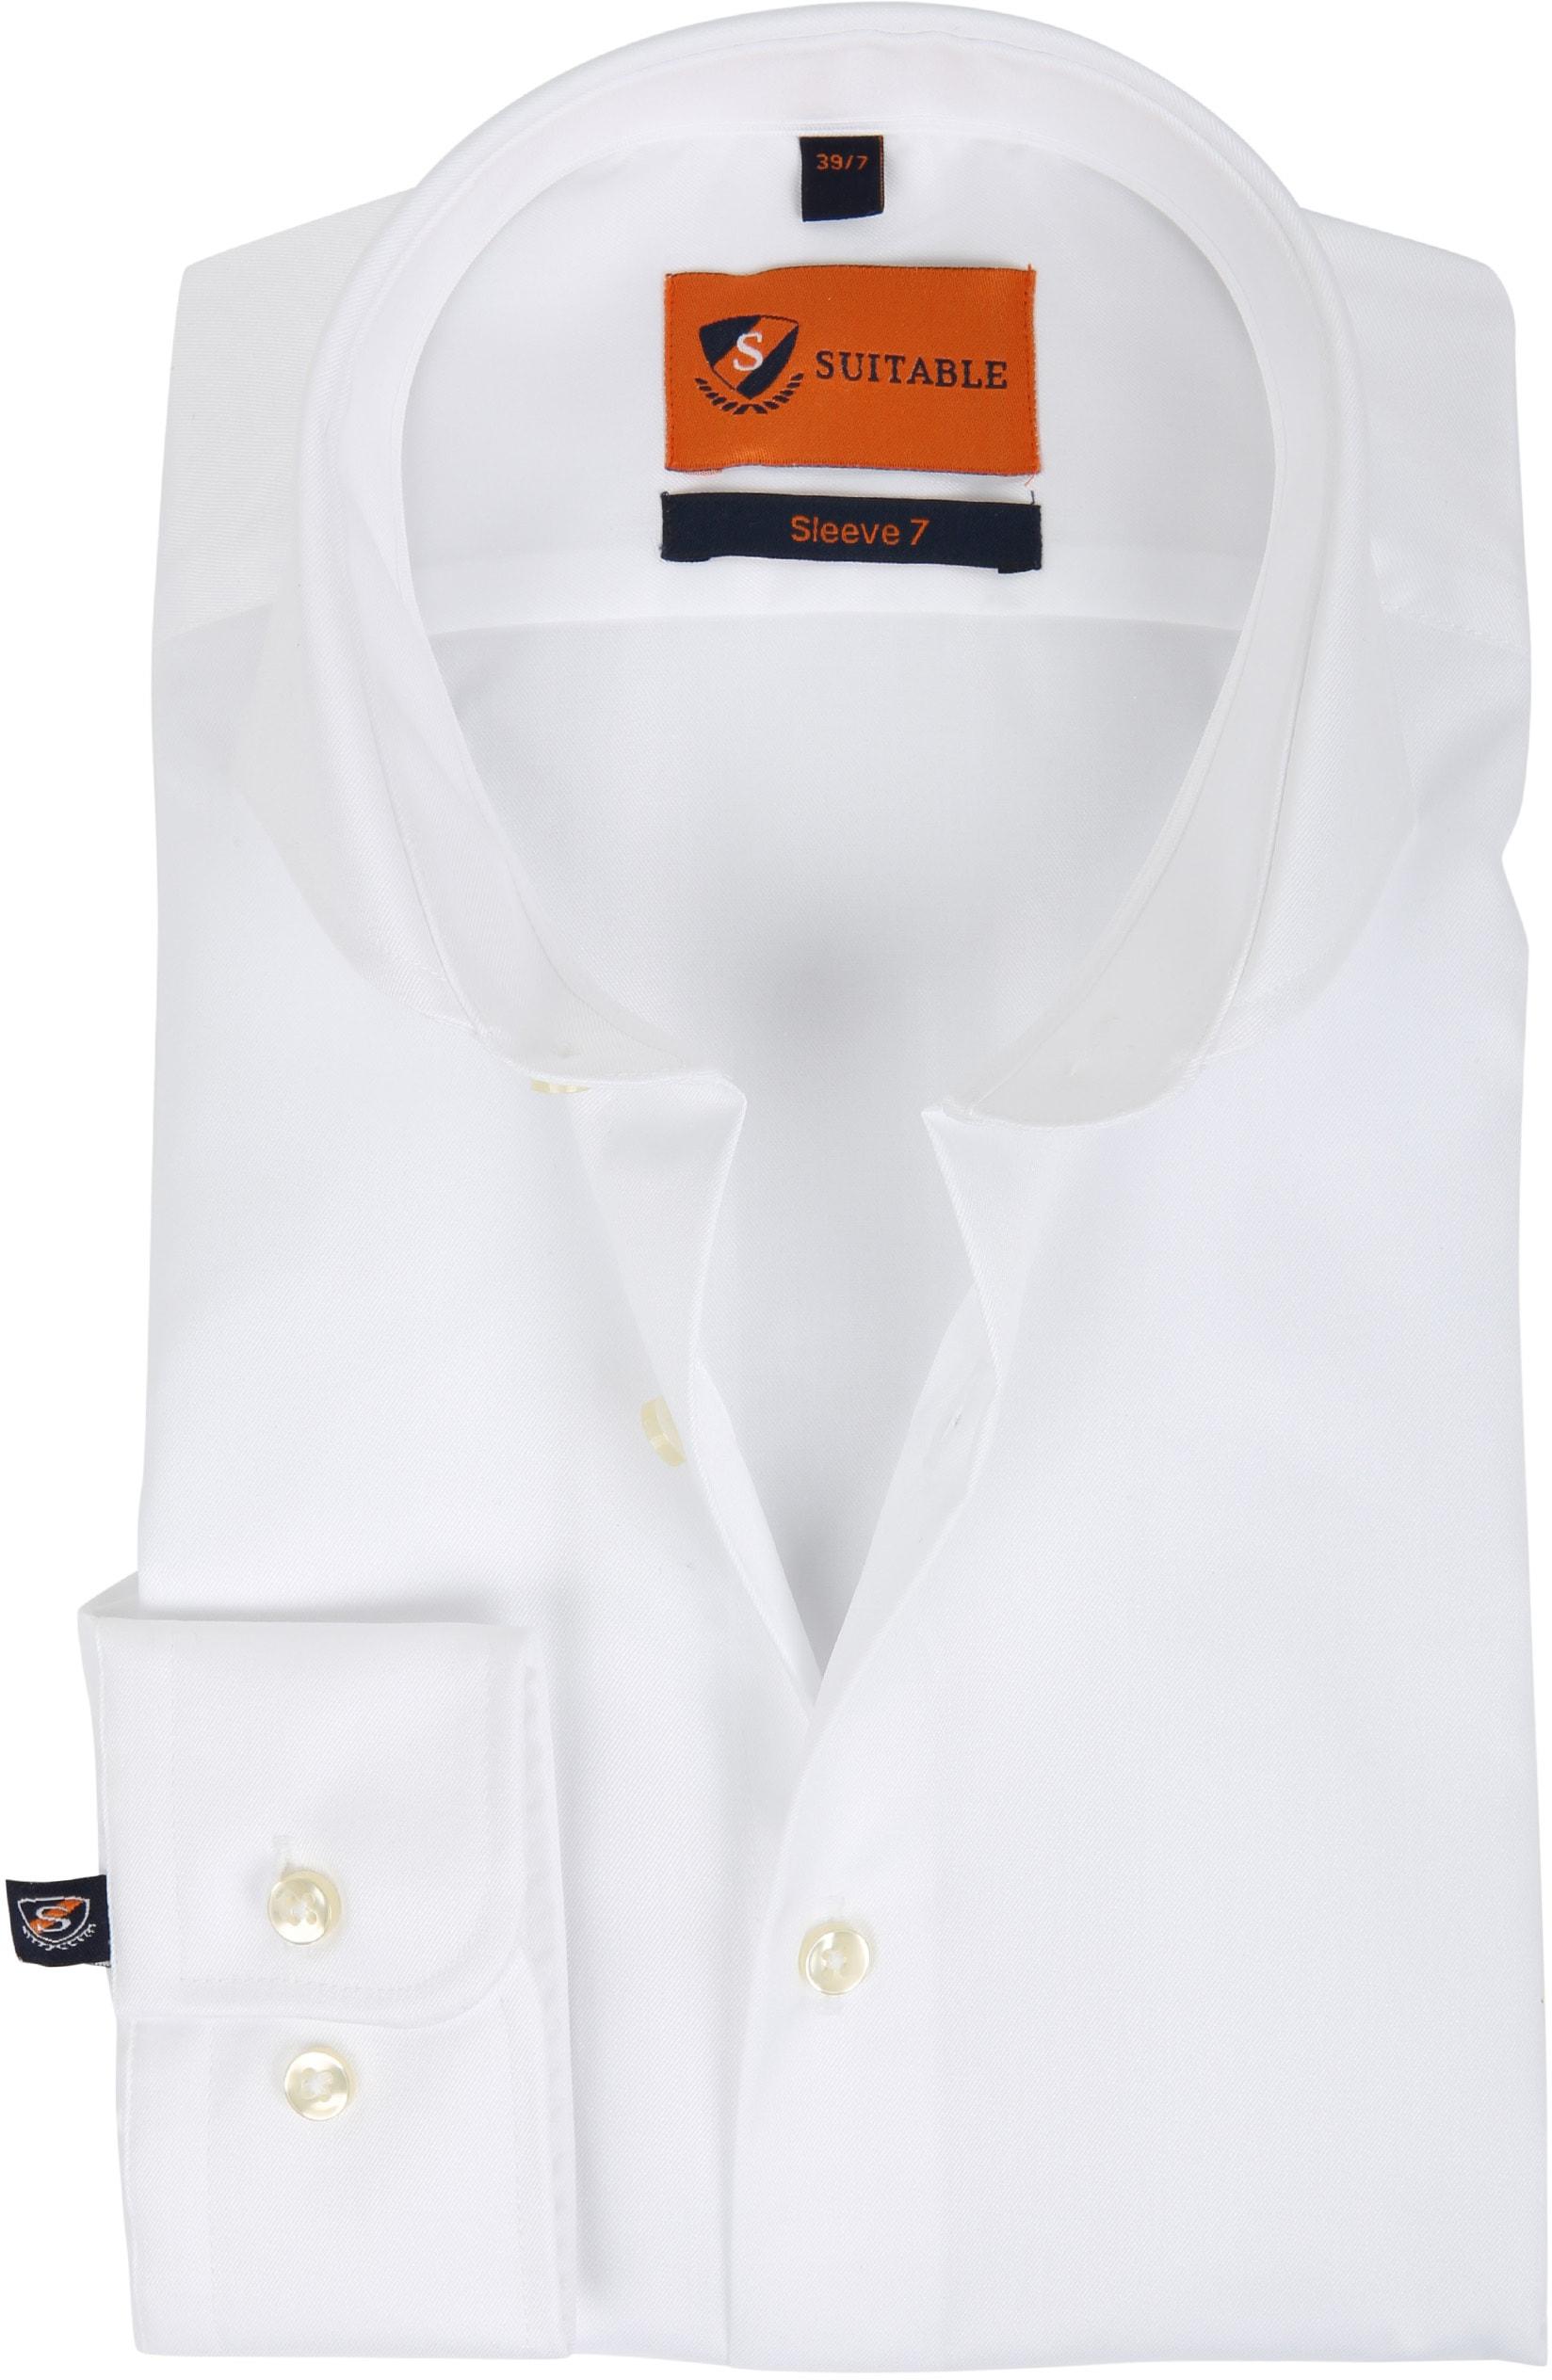 Suitable Overhemd SL7 Wit 180-1 foto 0